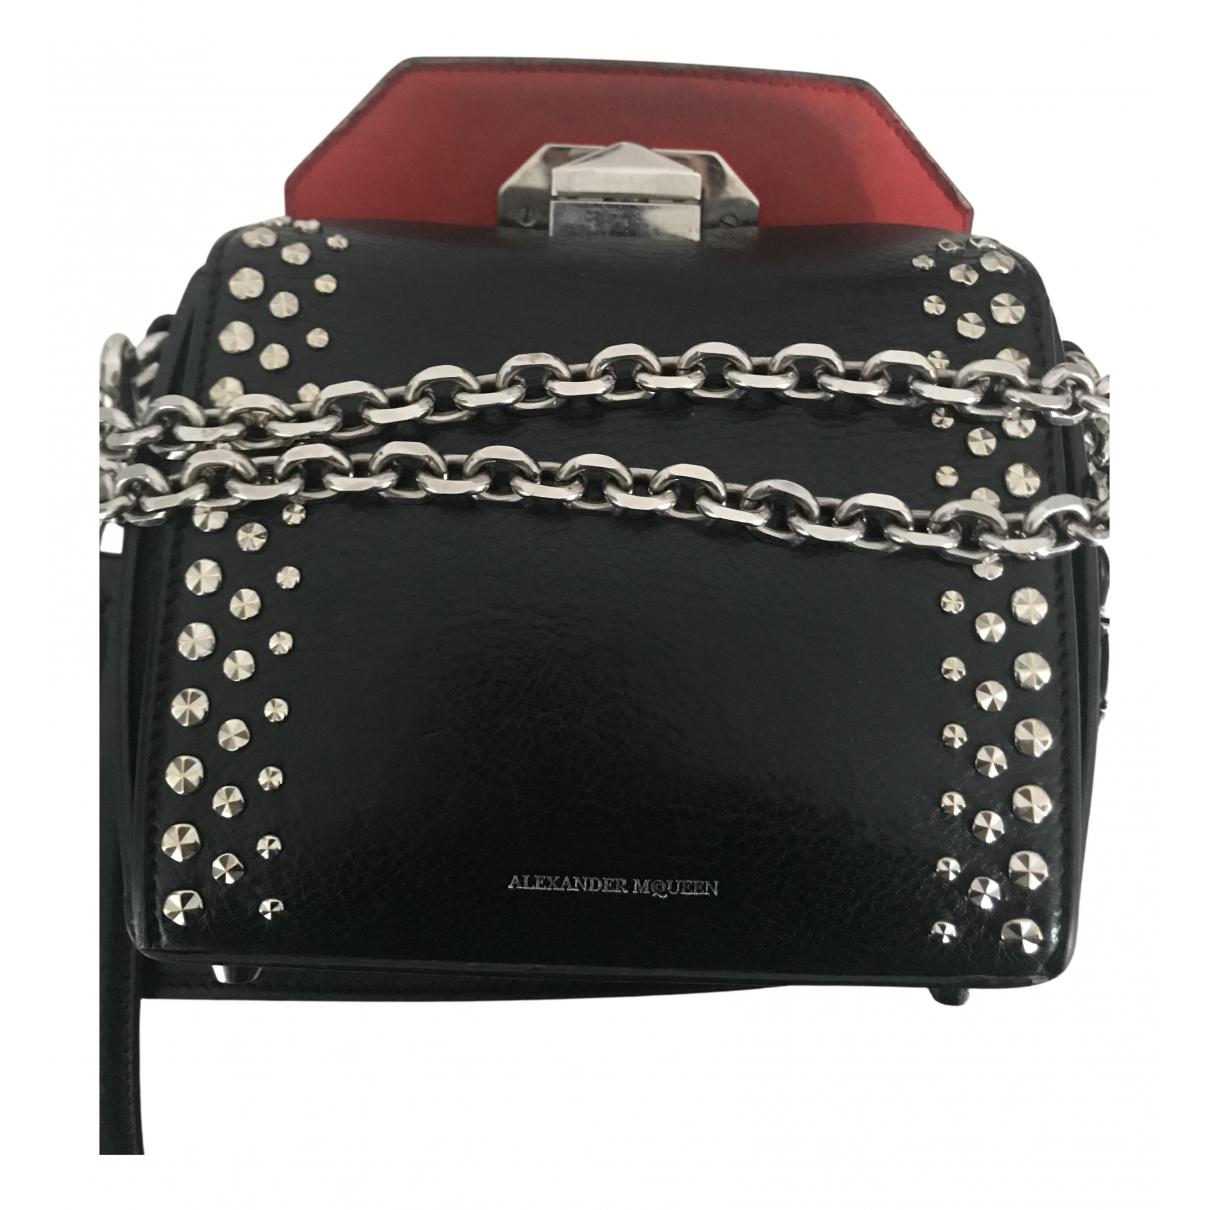 Alexander Mcqueen Box 16 Handtasche in  Schwarz Leder